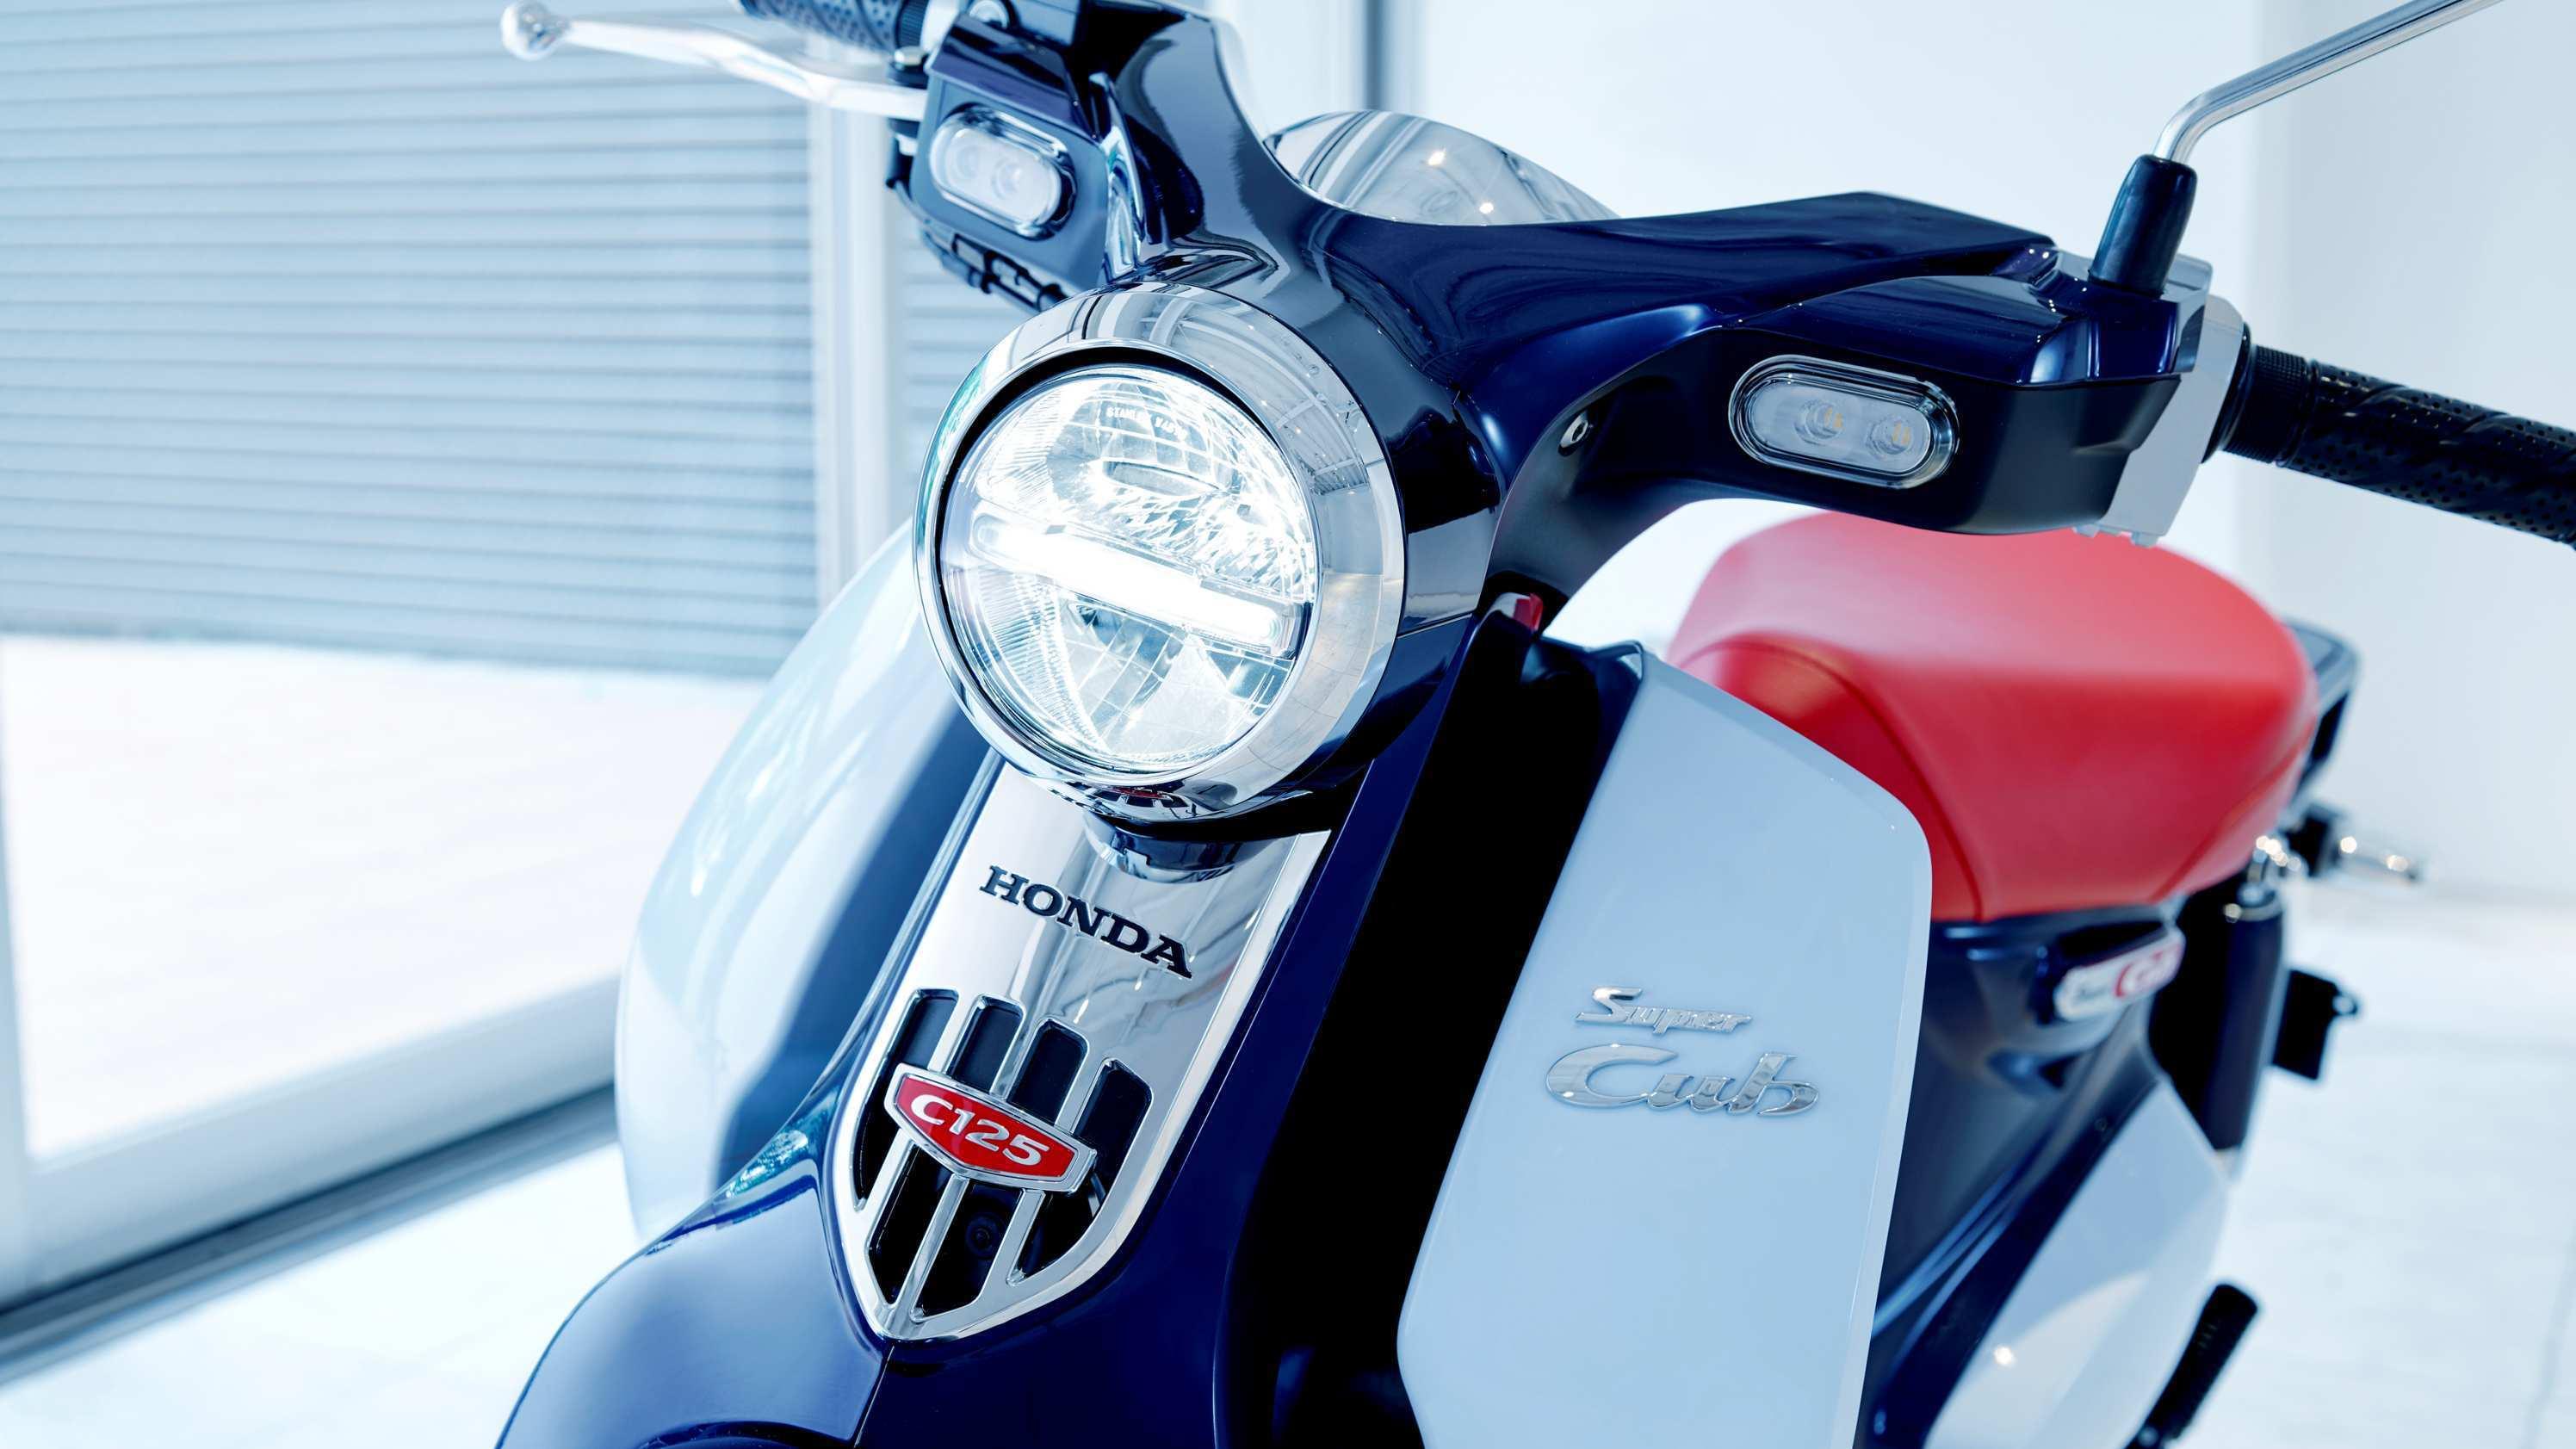 63 The 2019 Honda 125 Cub Speed Test with 2019 Honda 125 Cub